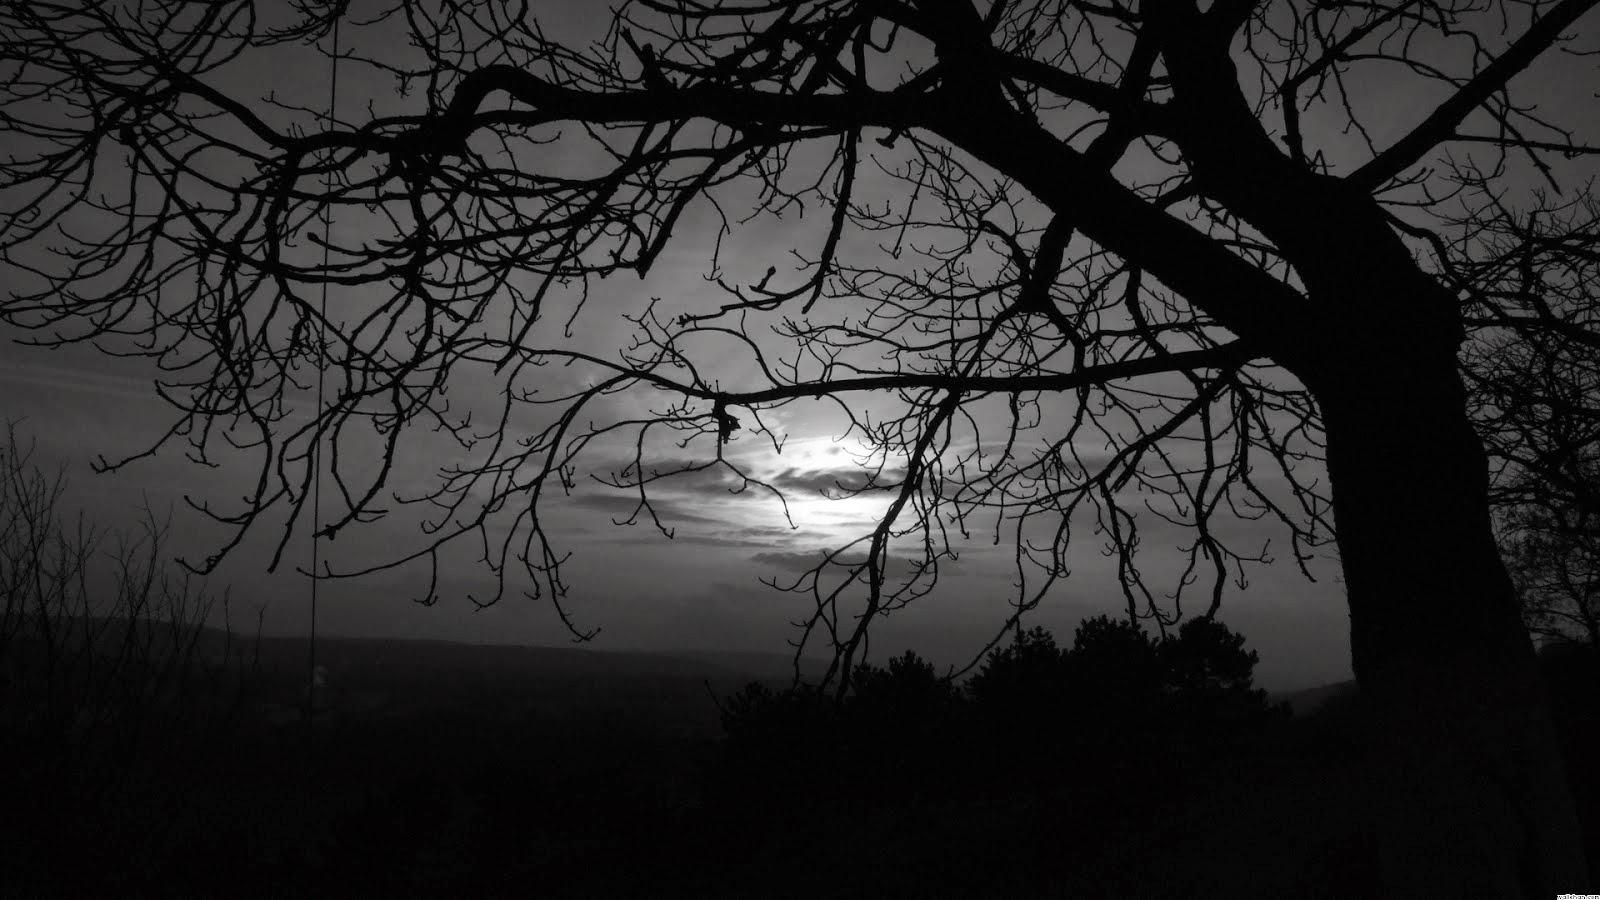 Wallpaper Gambar Gambar Misteri Dark Kegelapan GUDANG GAMBAR